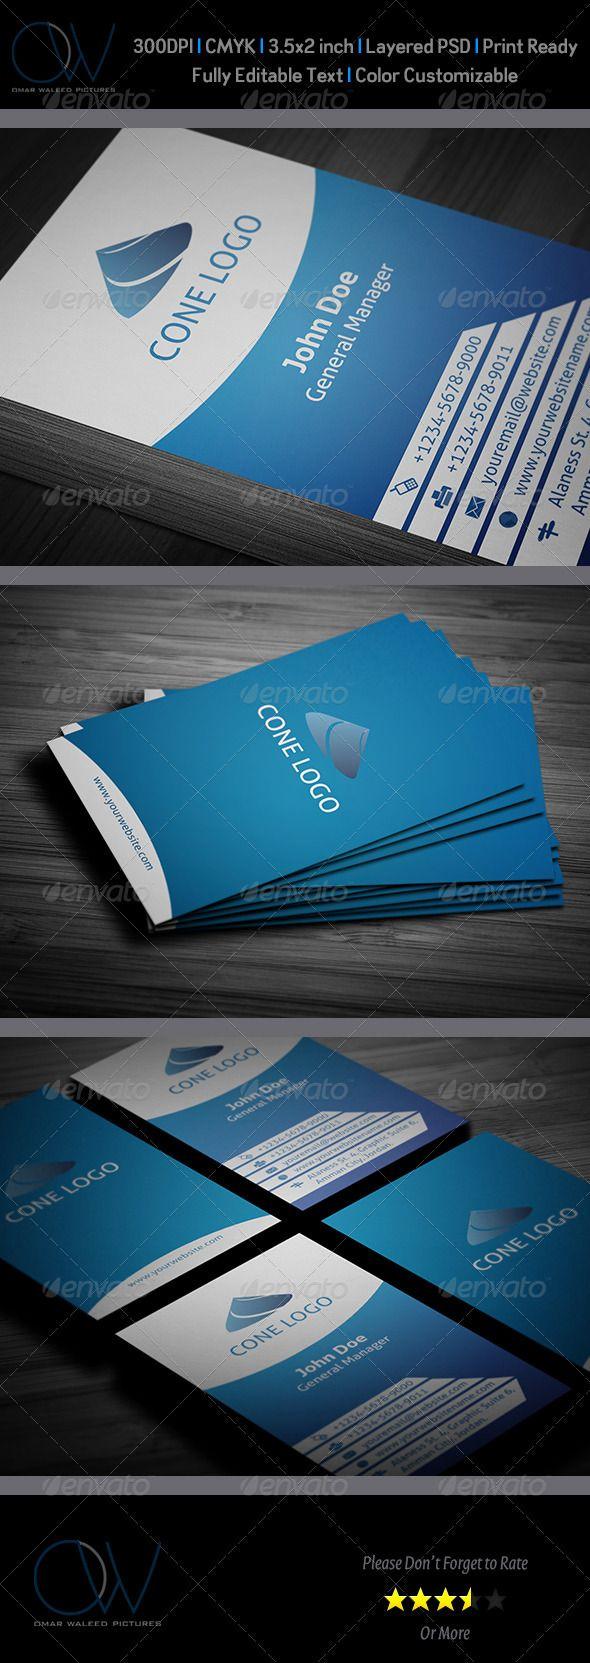 33 Best Business Cards Images On Pinterest Backgrounds Carte De